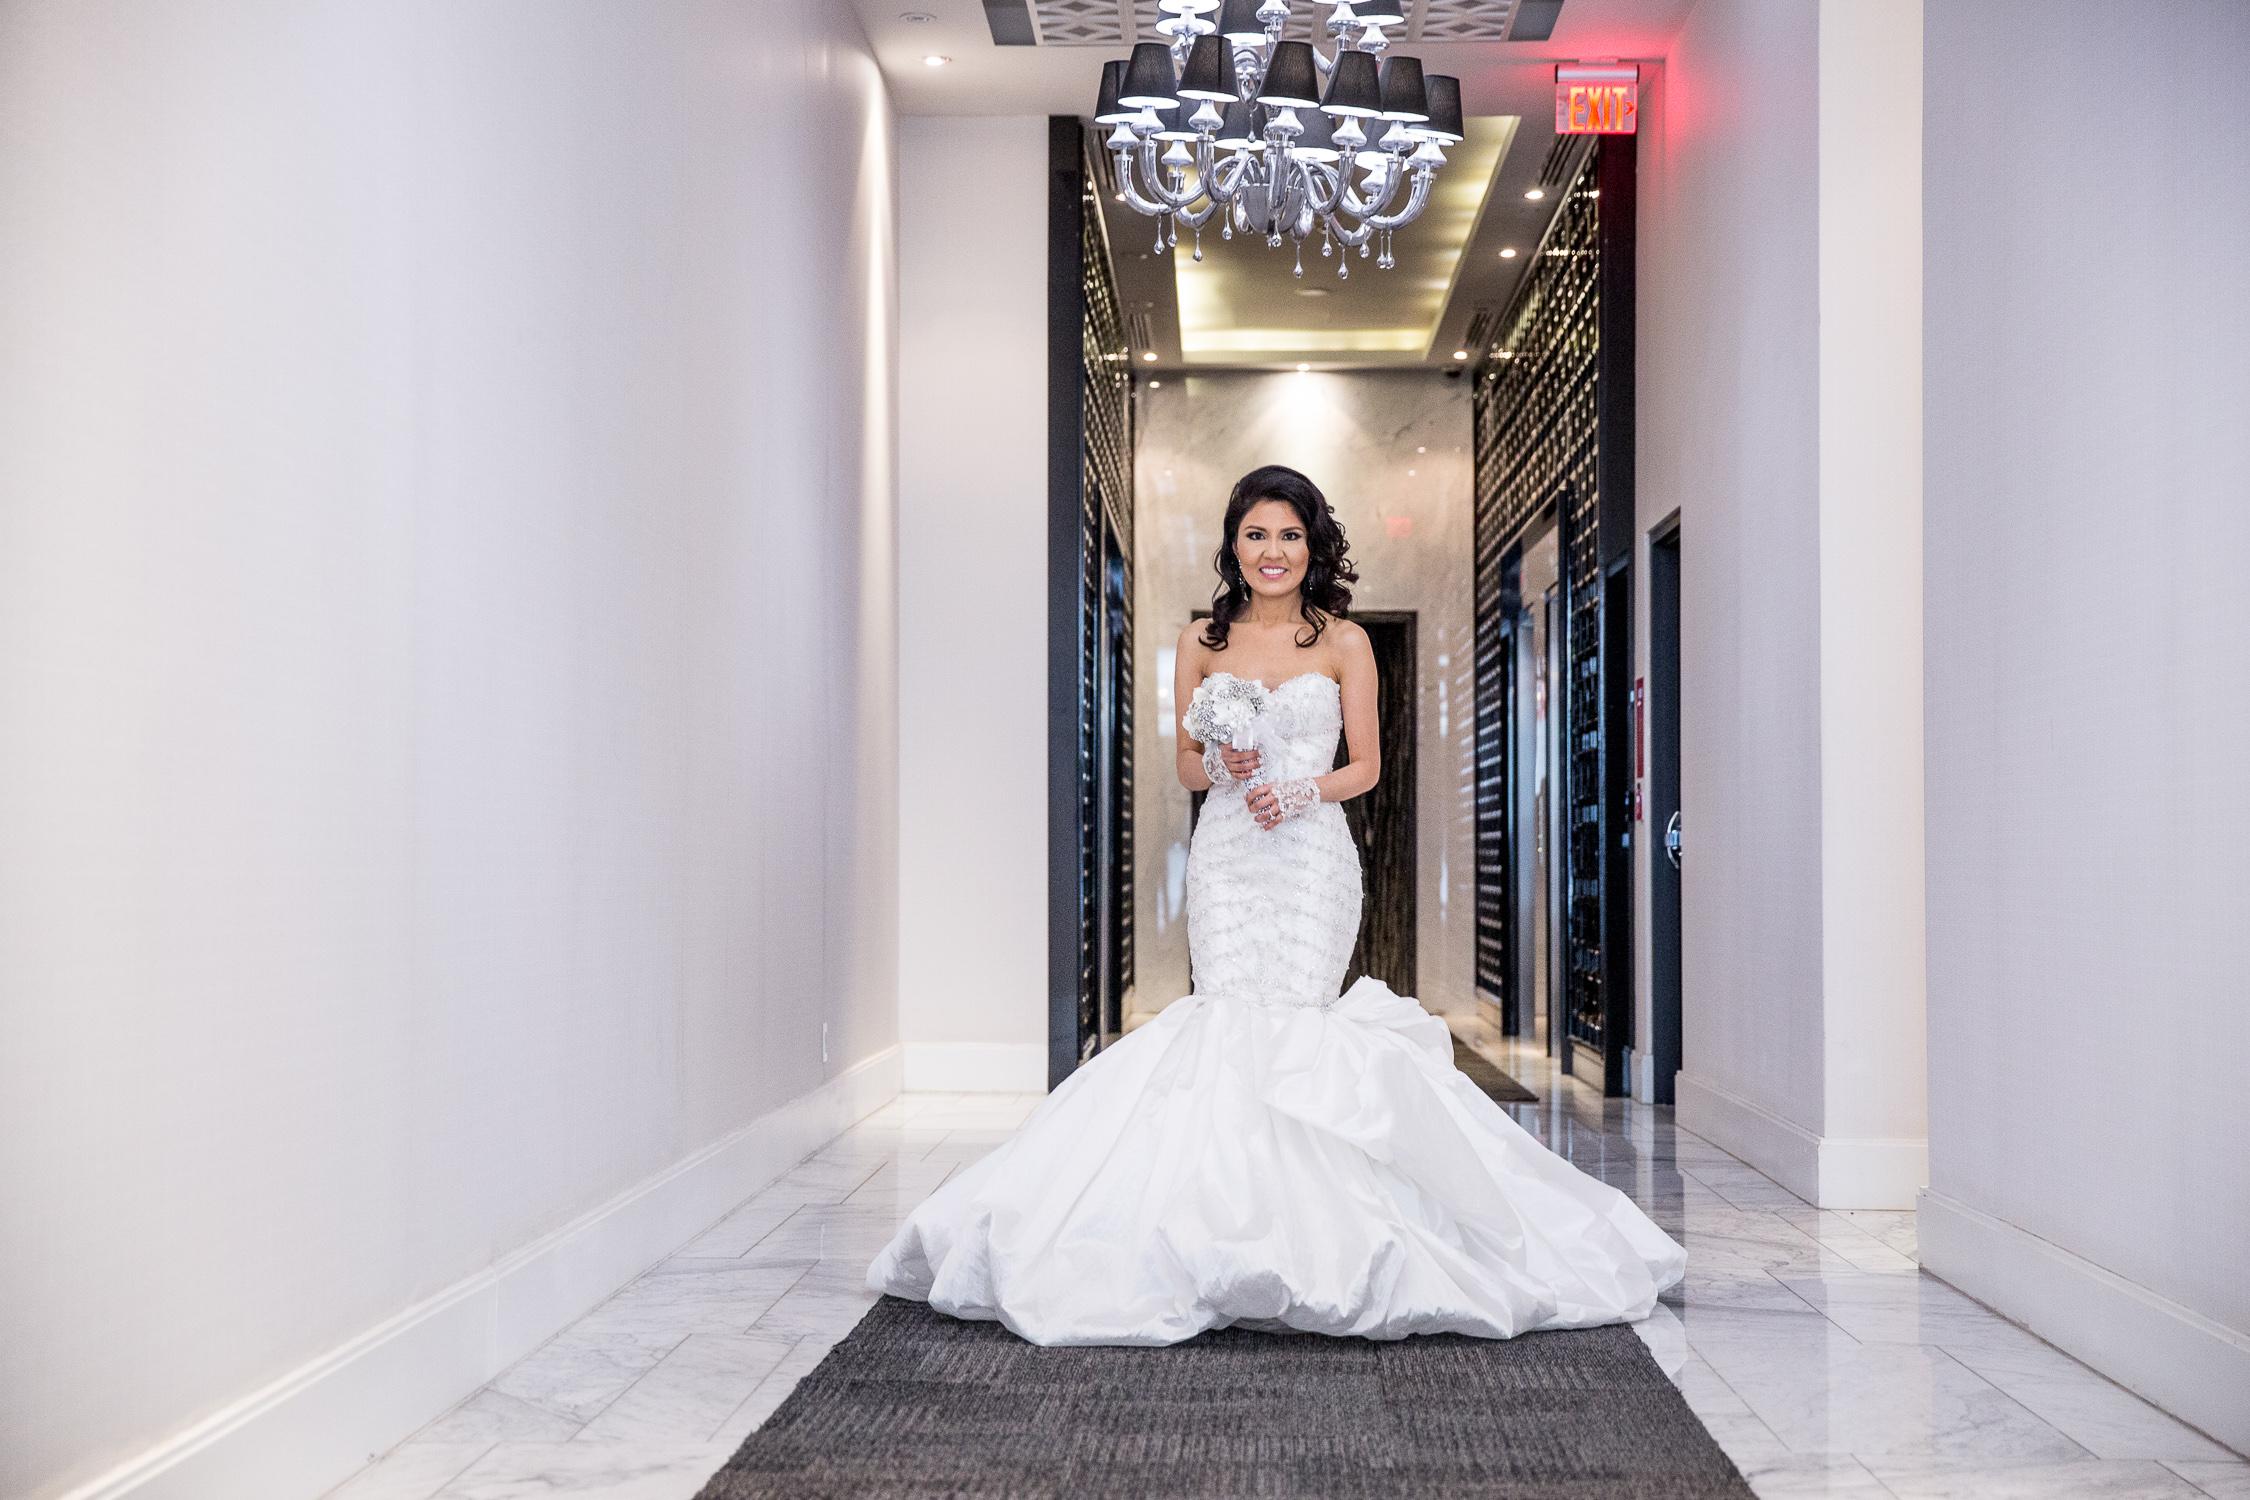 Paradise-Banquet-Hall-Wedding-Vaughan-Ontario-0021.jpg